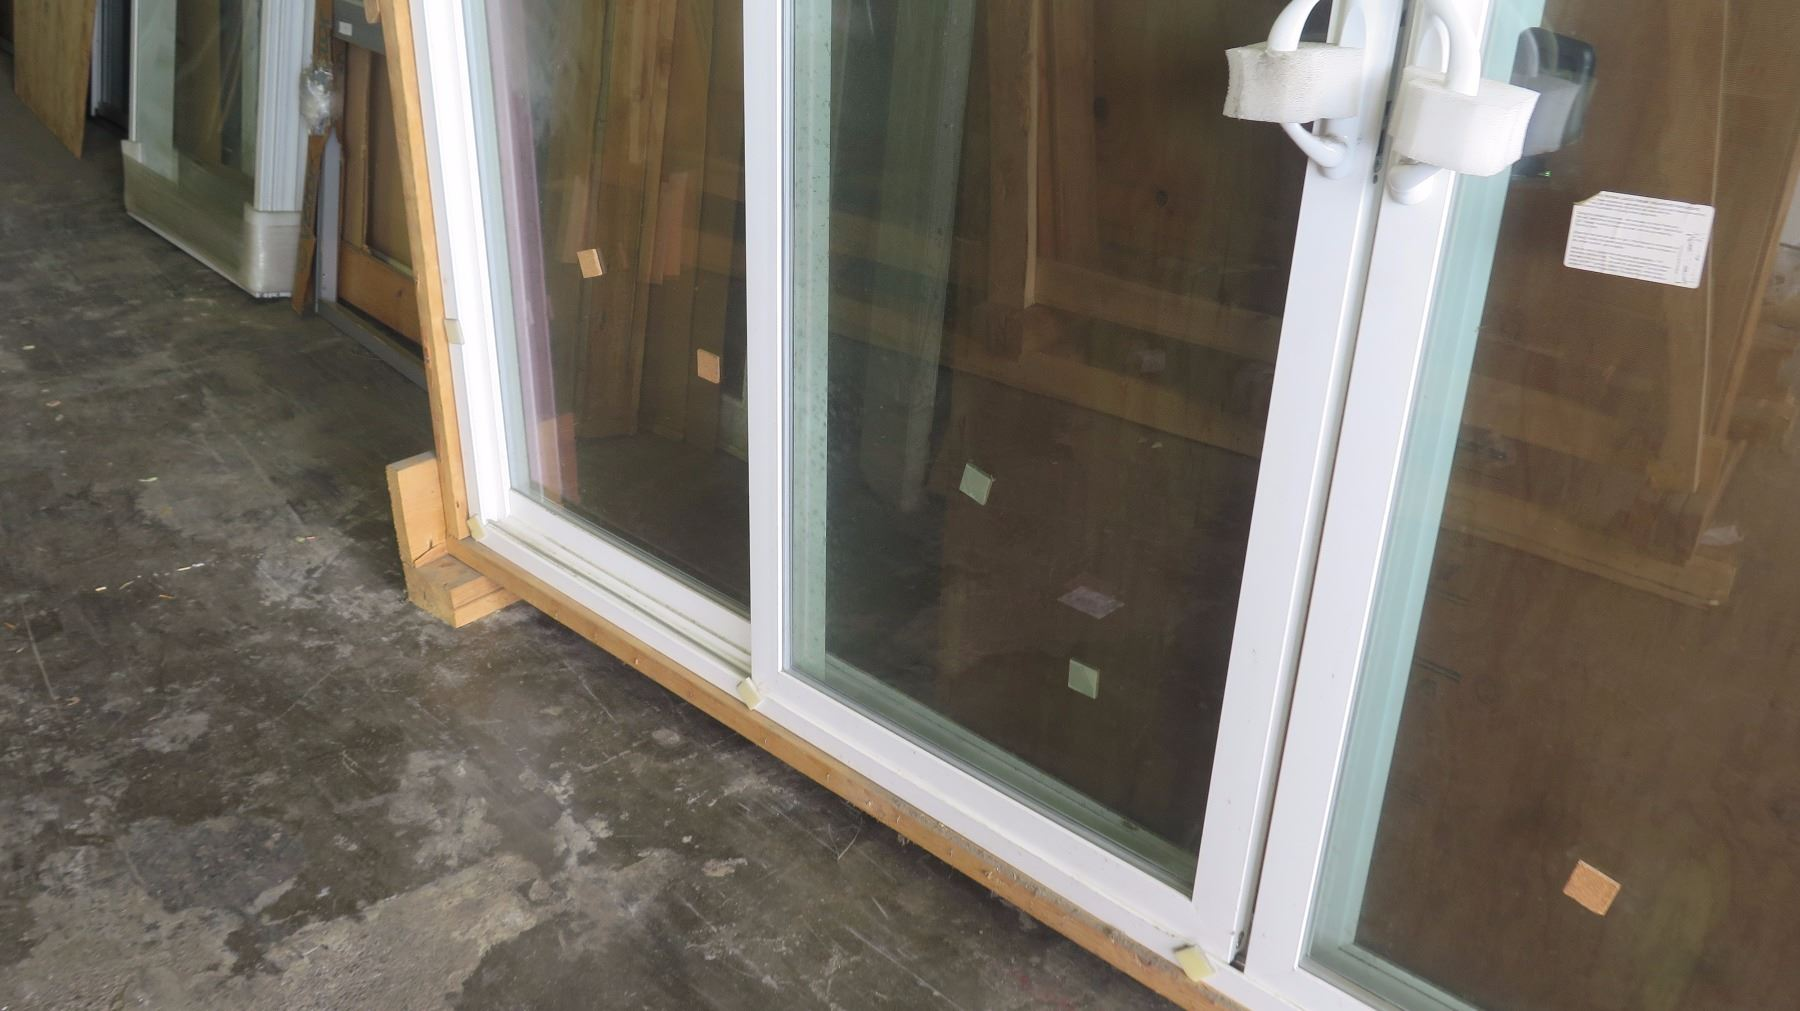 4 Panel Patio Sliding Glass Doors W Screen White Vinyl